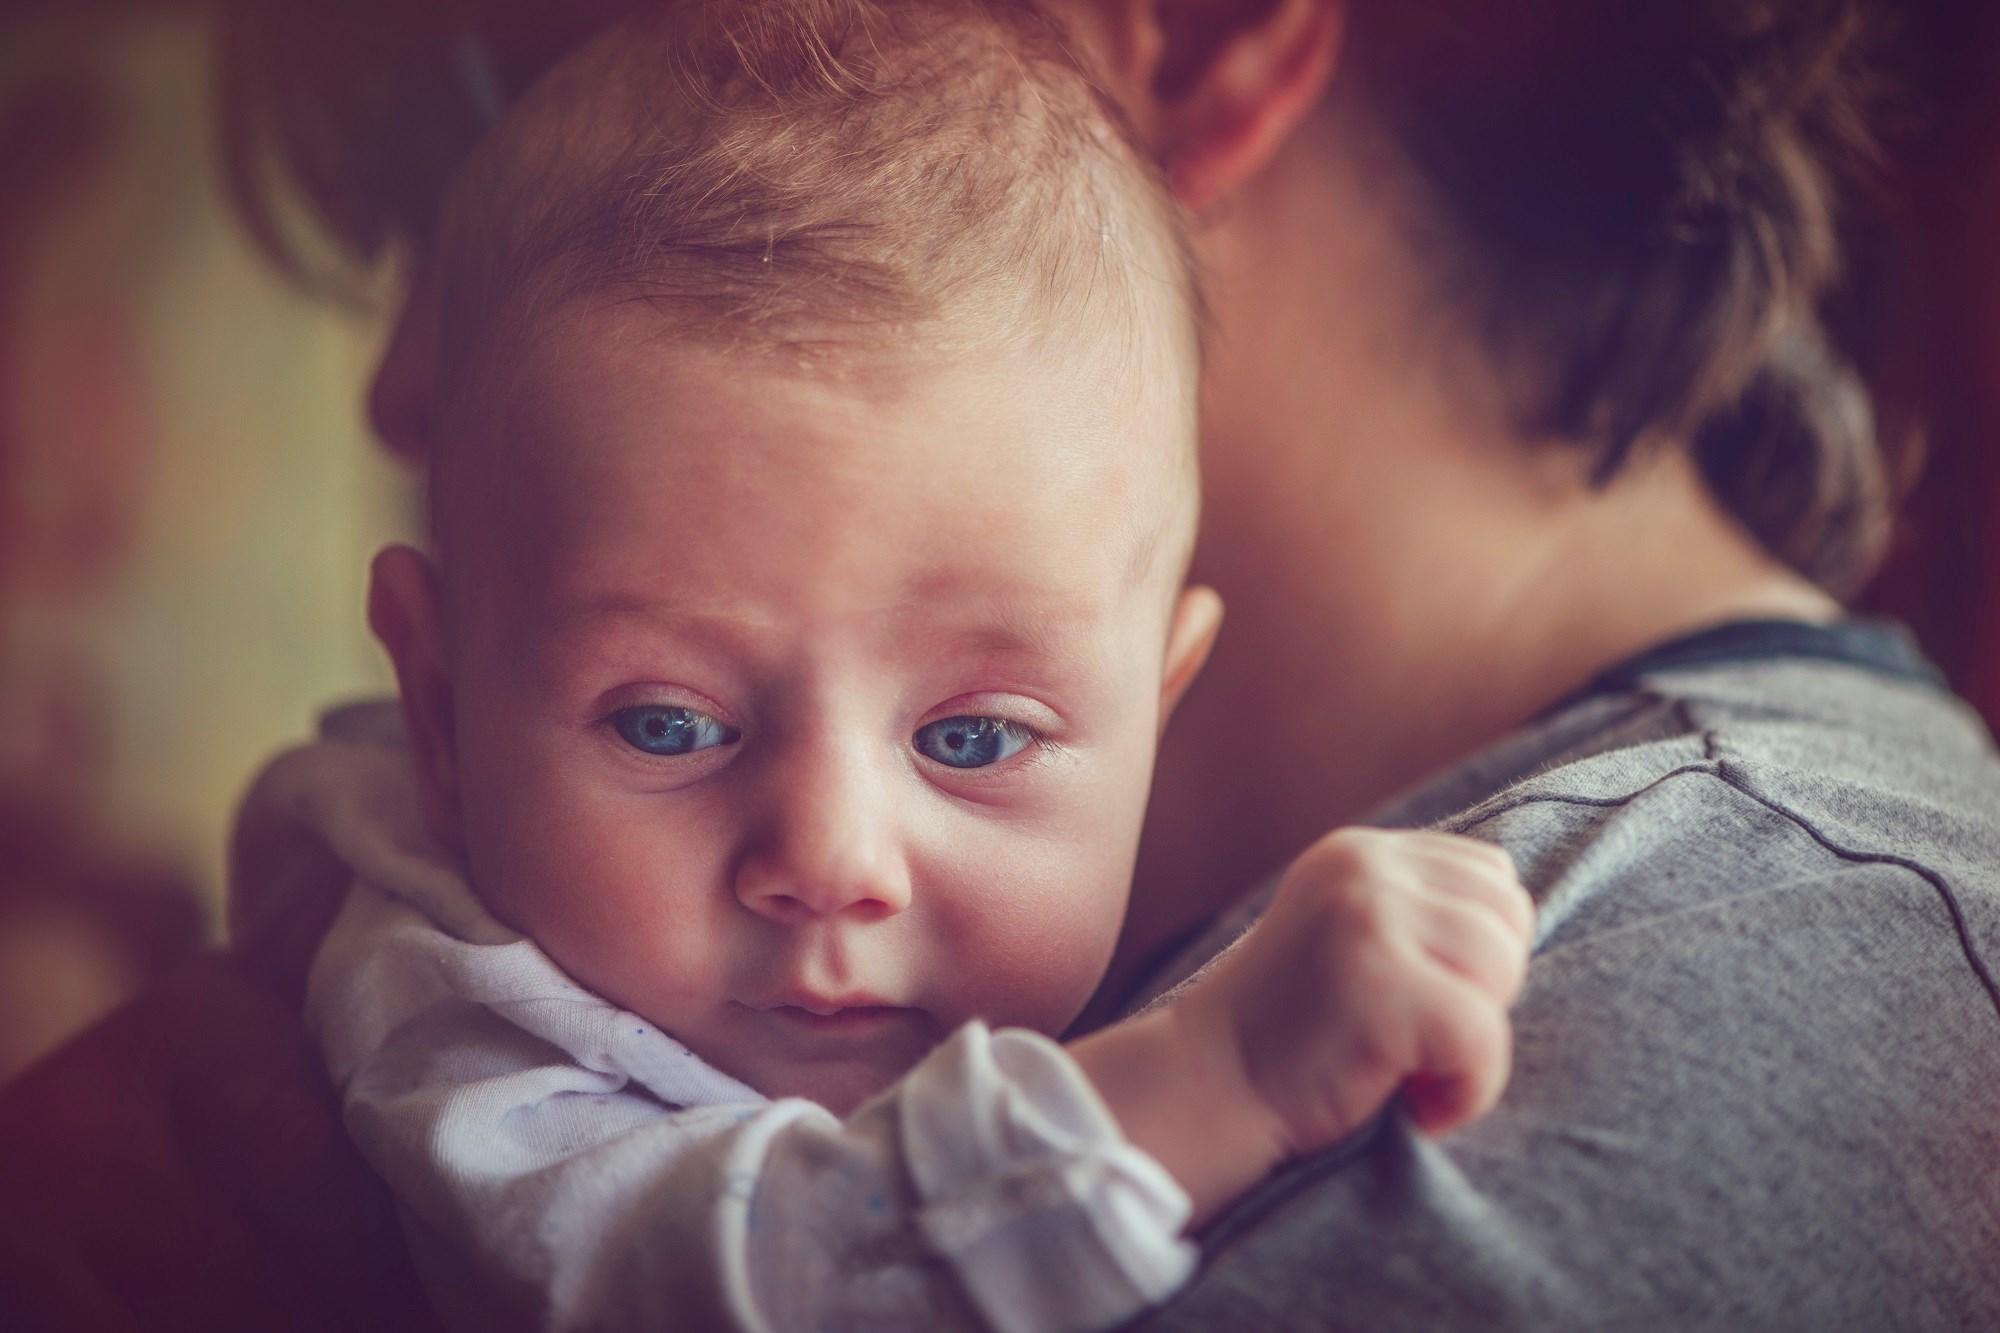 Postnatal Paternal Depression Associated With Depression in Girls